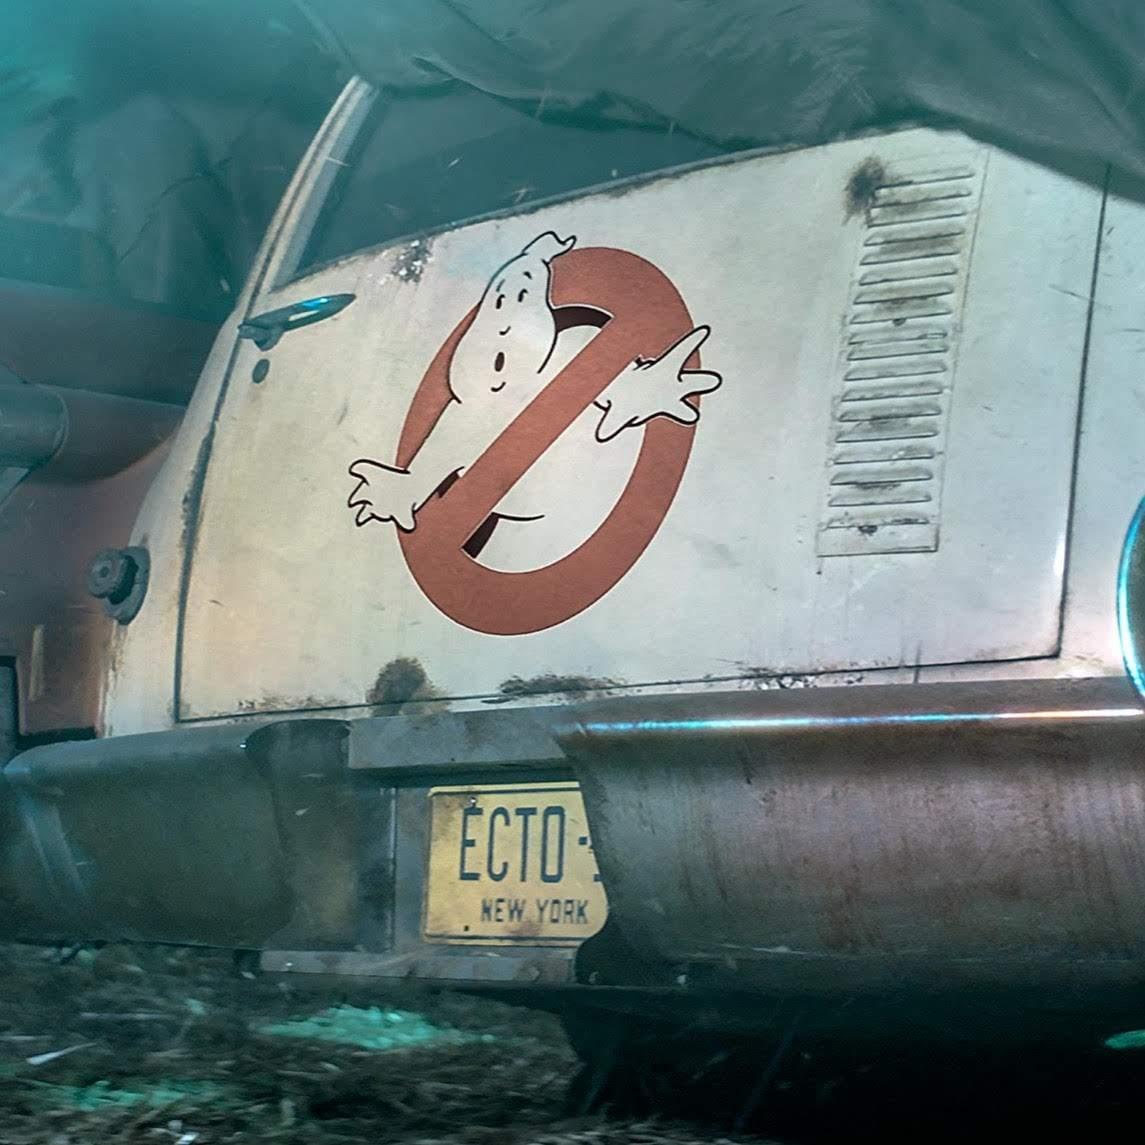 Ghostbusters 3 : あの幽霊退治人たちの物語のその後を描く「ゴーストバスターズ」のオリジナル・シリーズの第3弾が撮影に先がけて、予告編を初公開 ! !